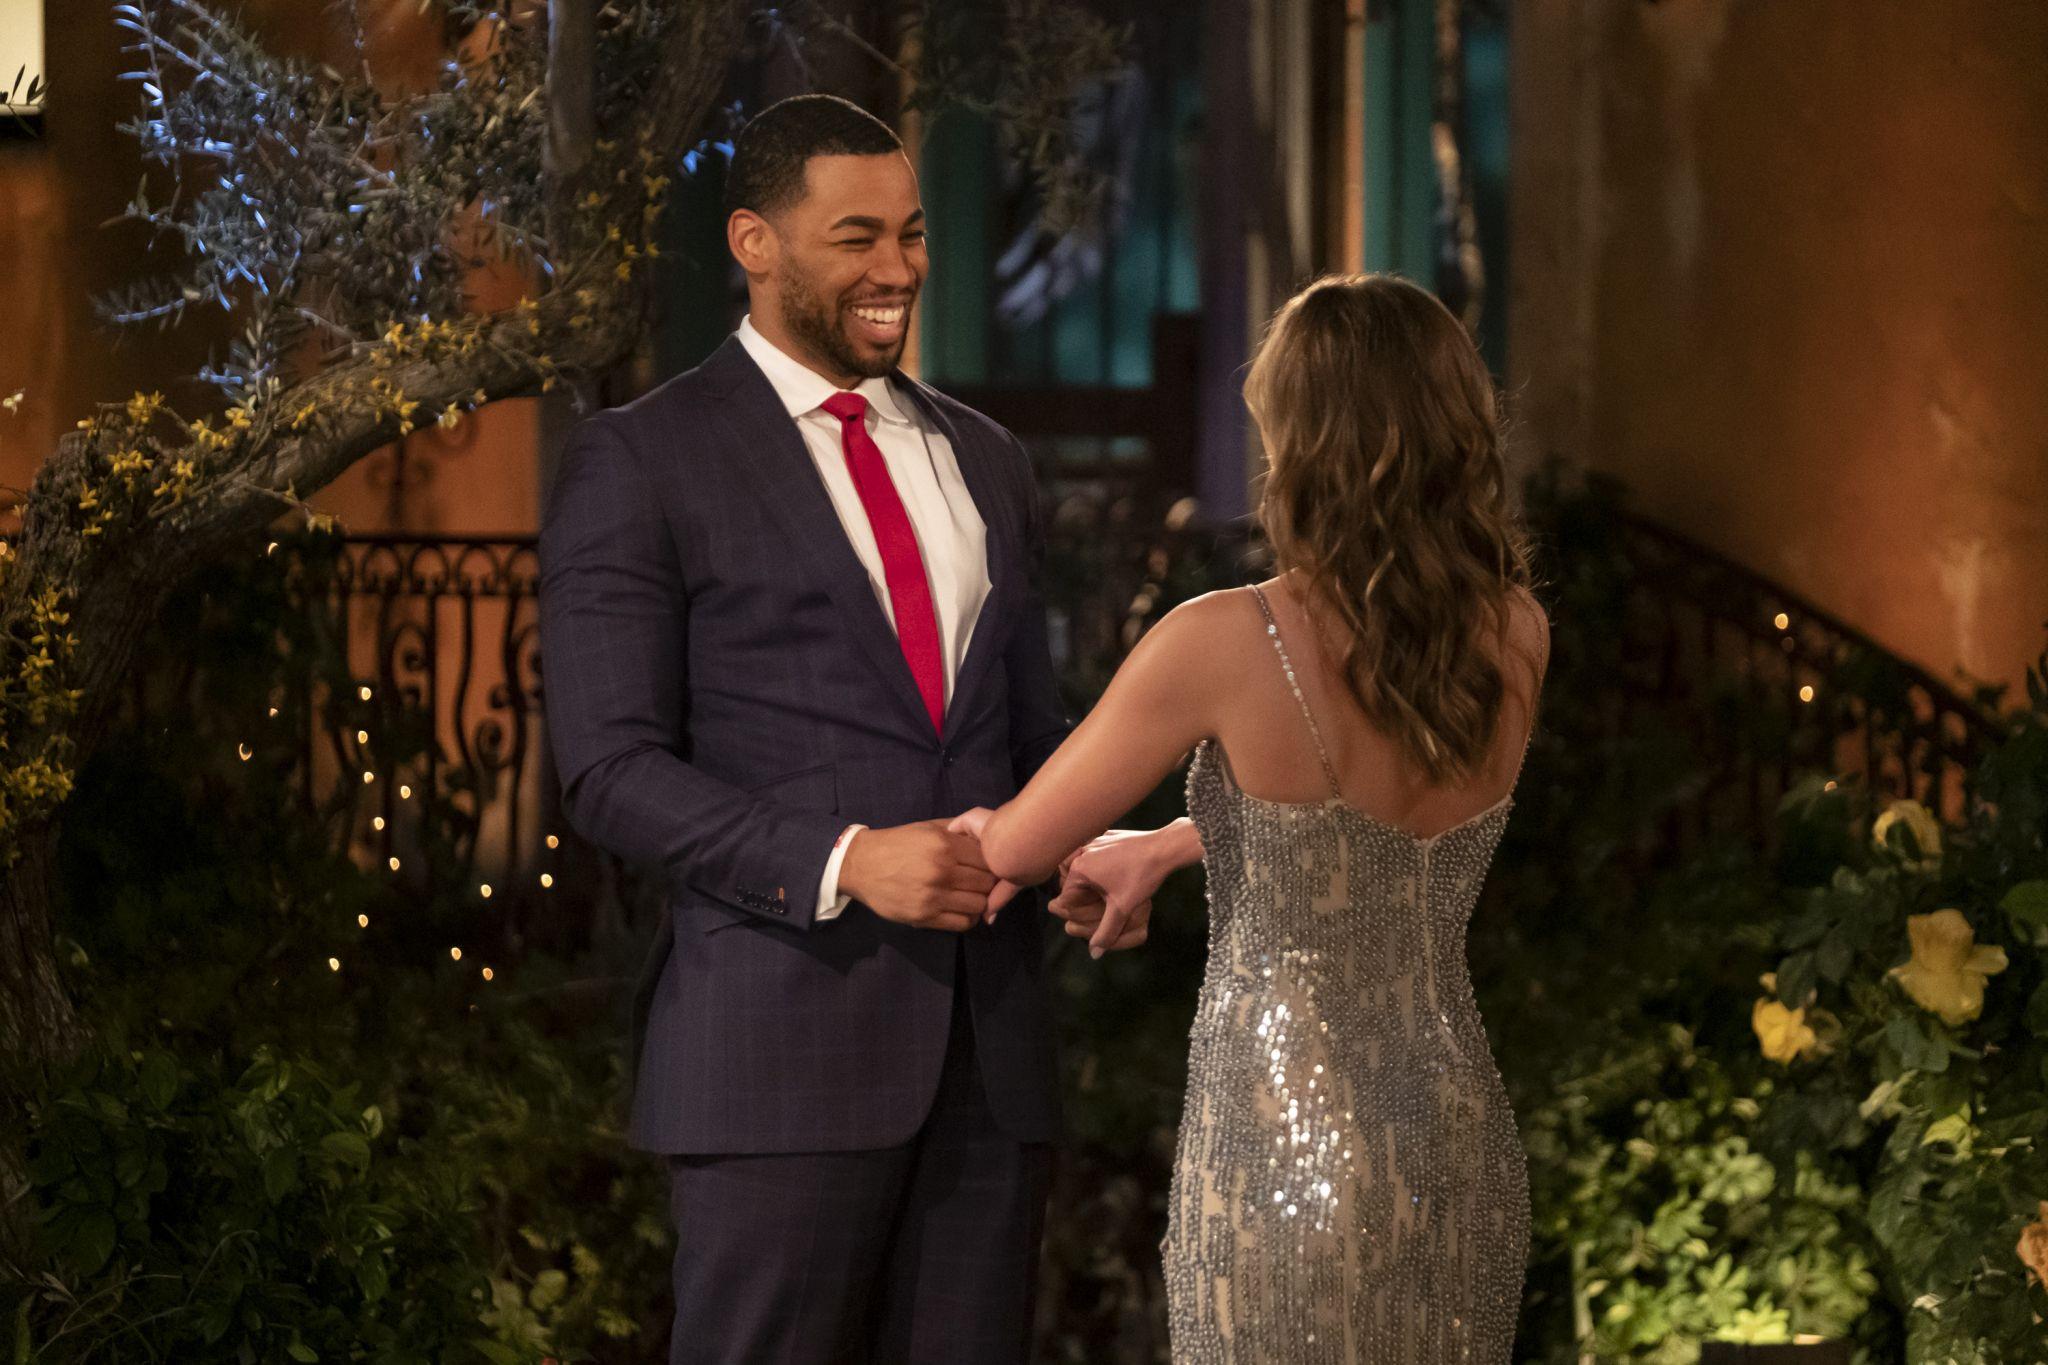 'Bachelor' Nation wants San Antonio contestant Mike Johnson to be the next bachelor